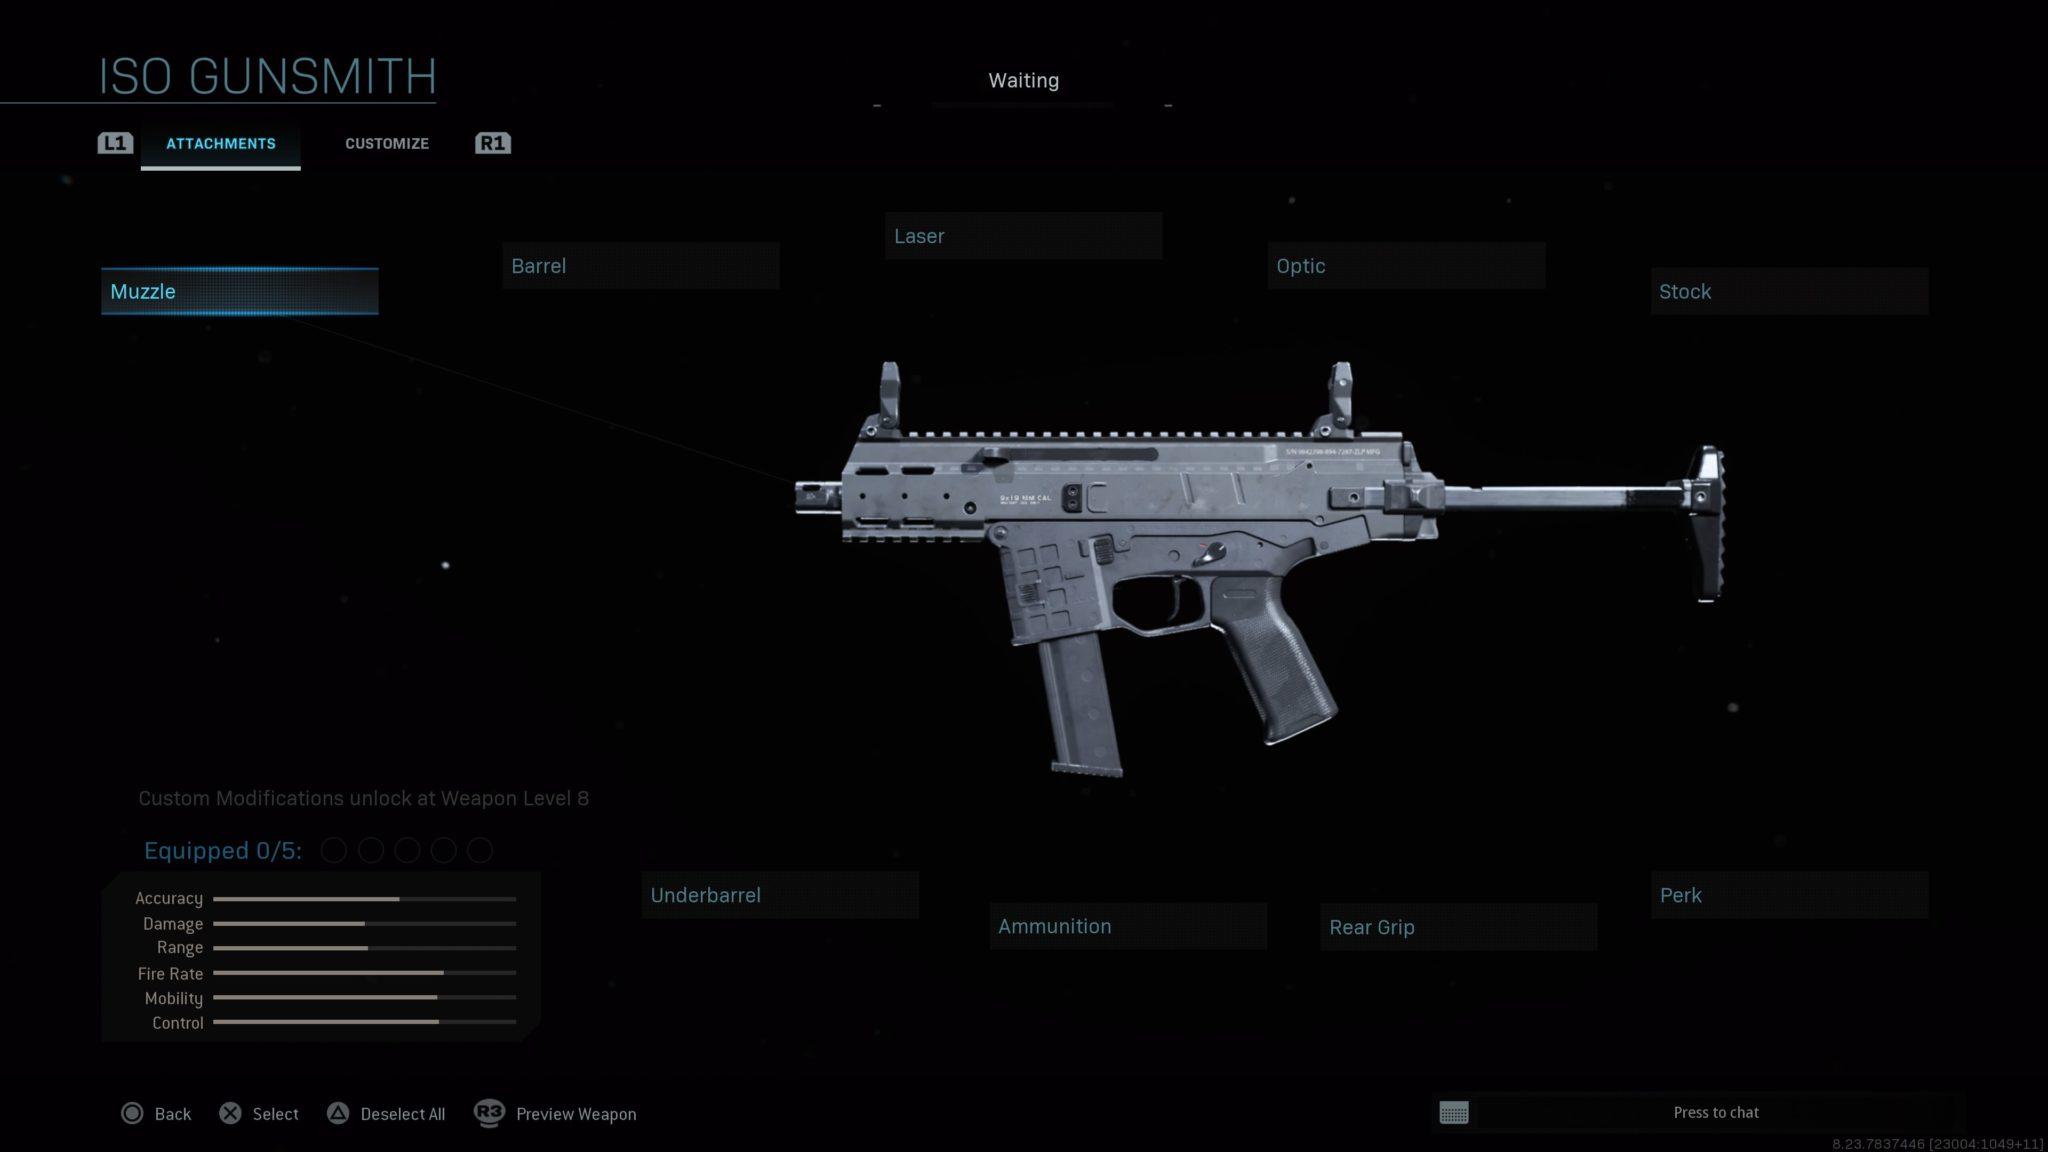 All the ISO submachine gun customization options in the Modern Wafare gunsmith.